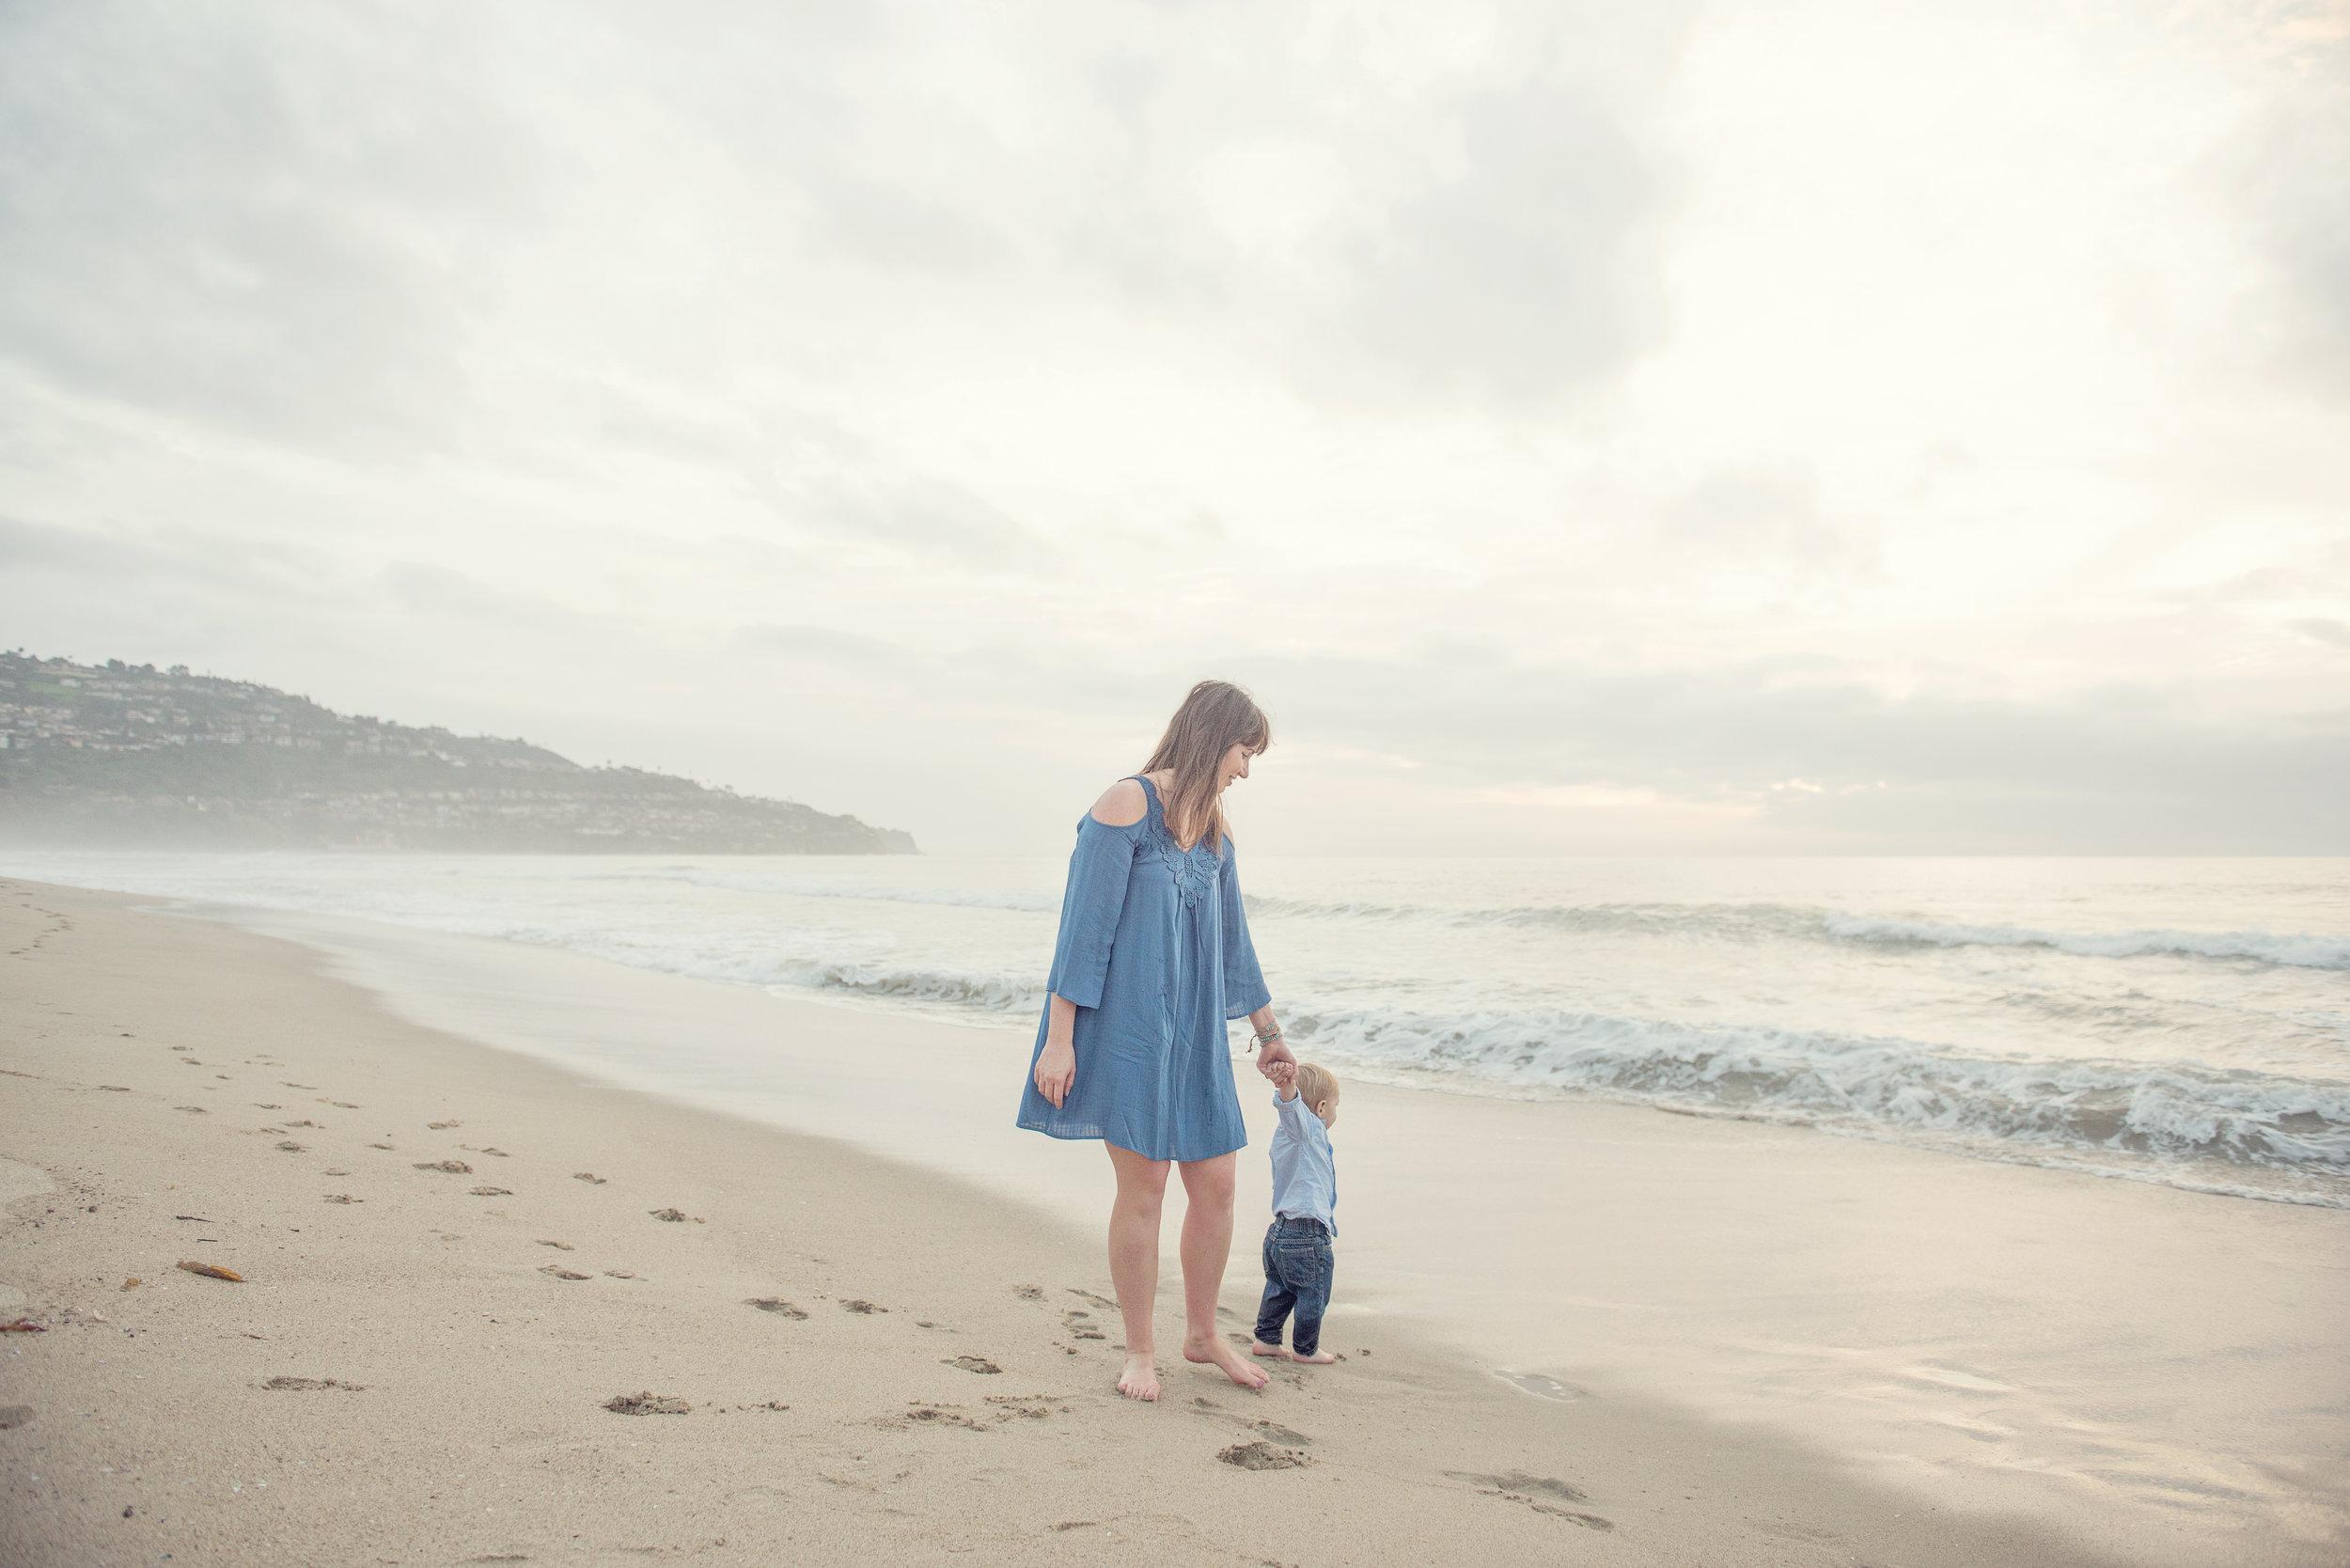 sample_beach-7.jpg